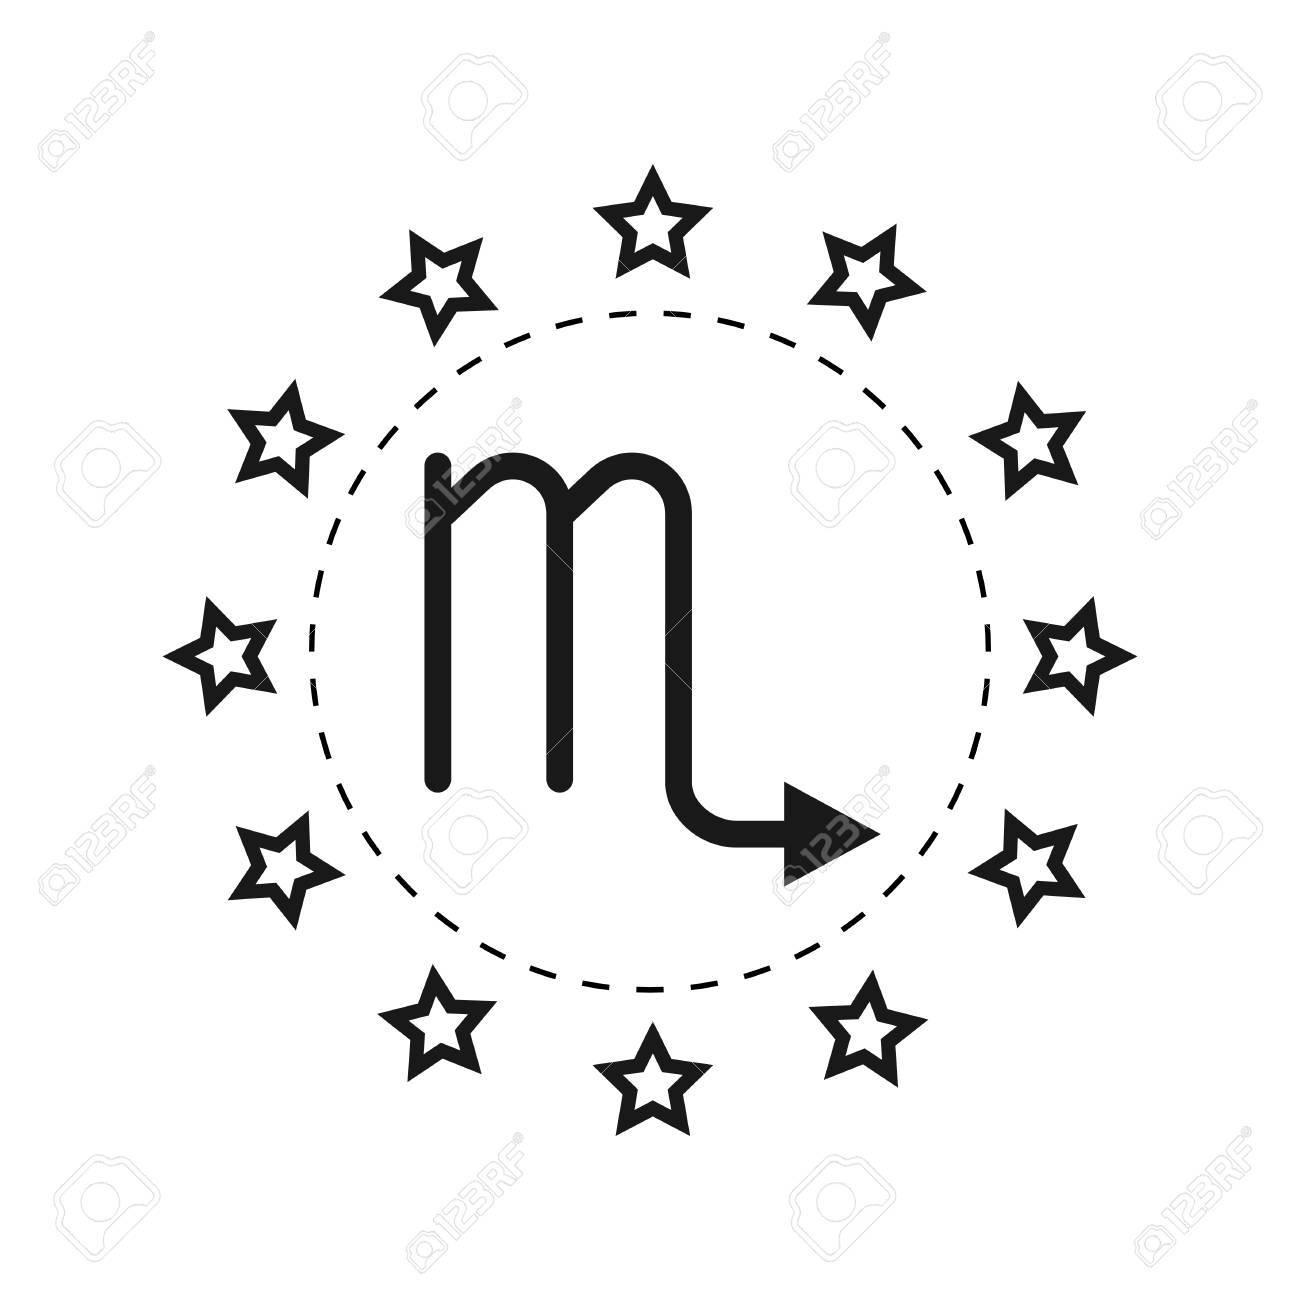 Scorpio  Sign of the zodiac  Flat symbol horoscope and predictions